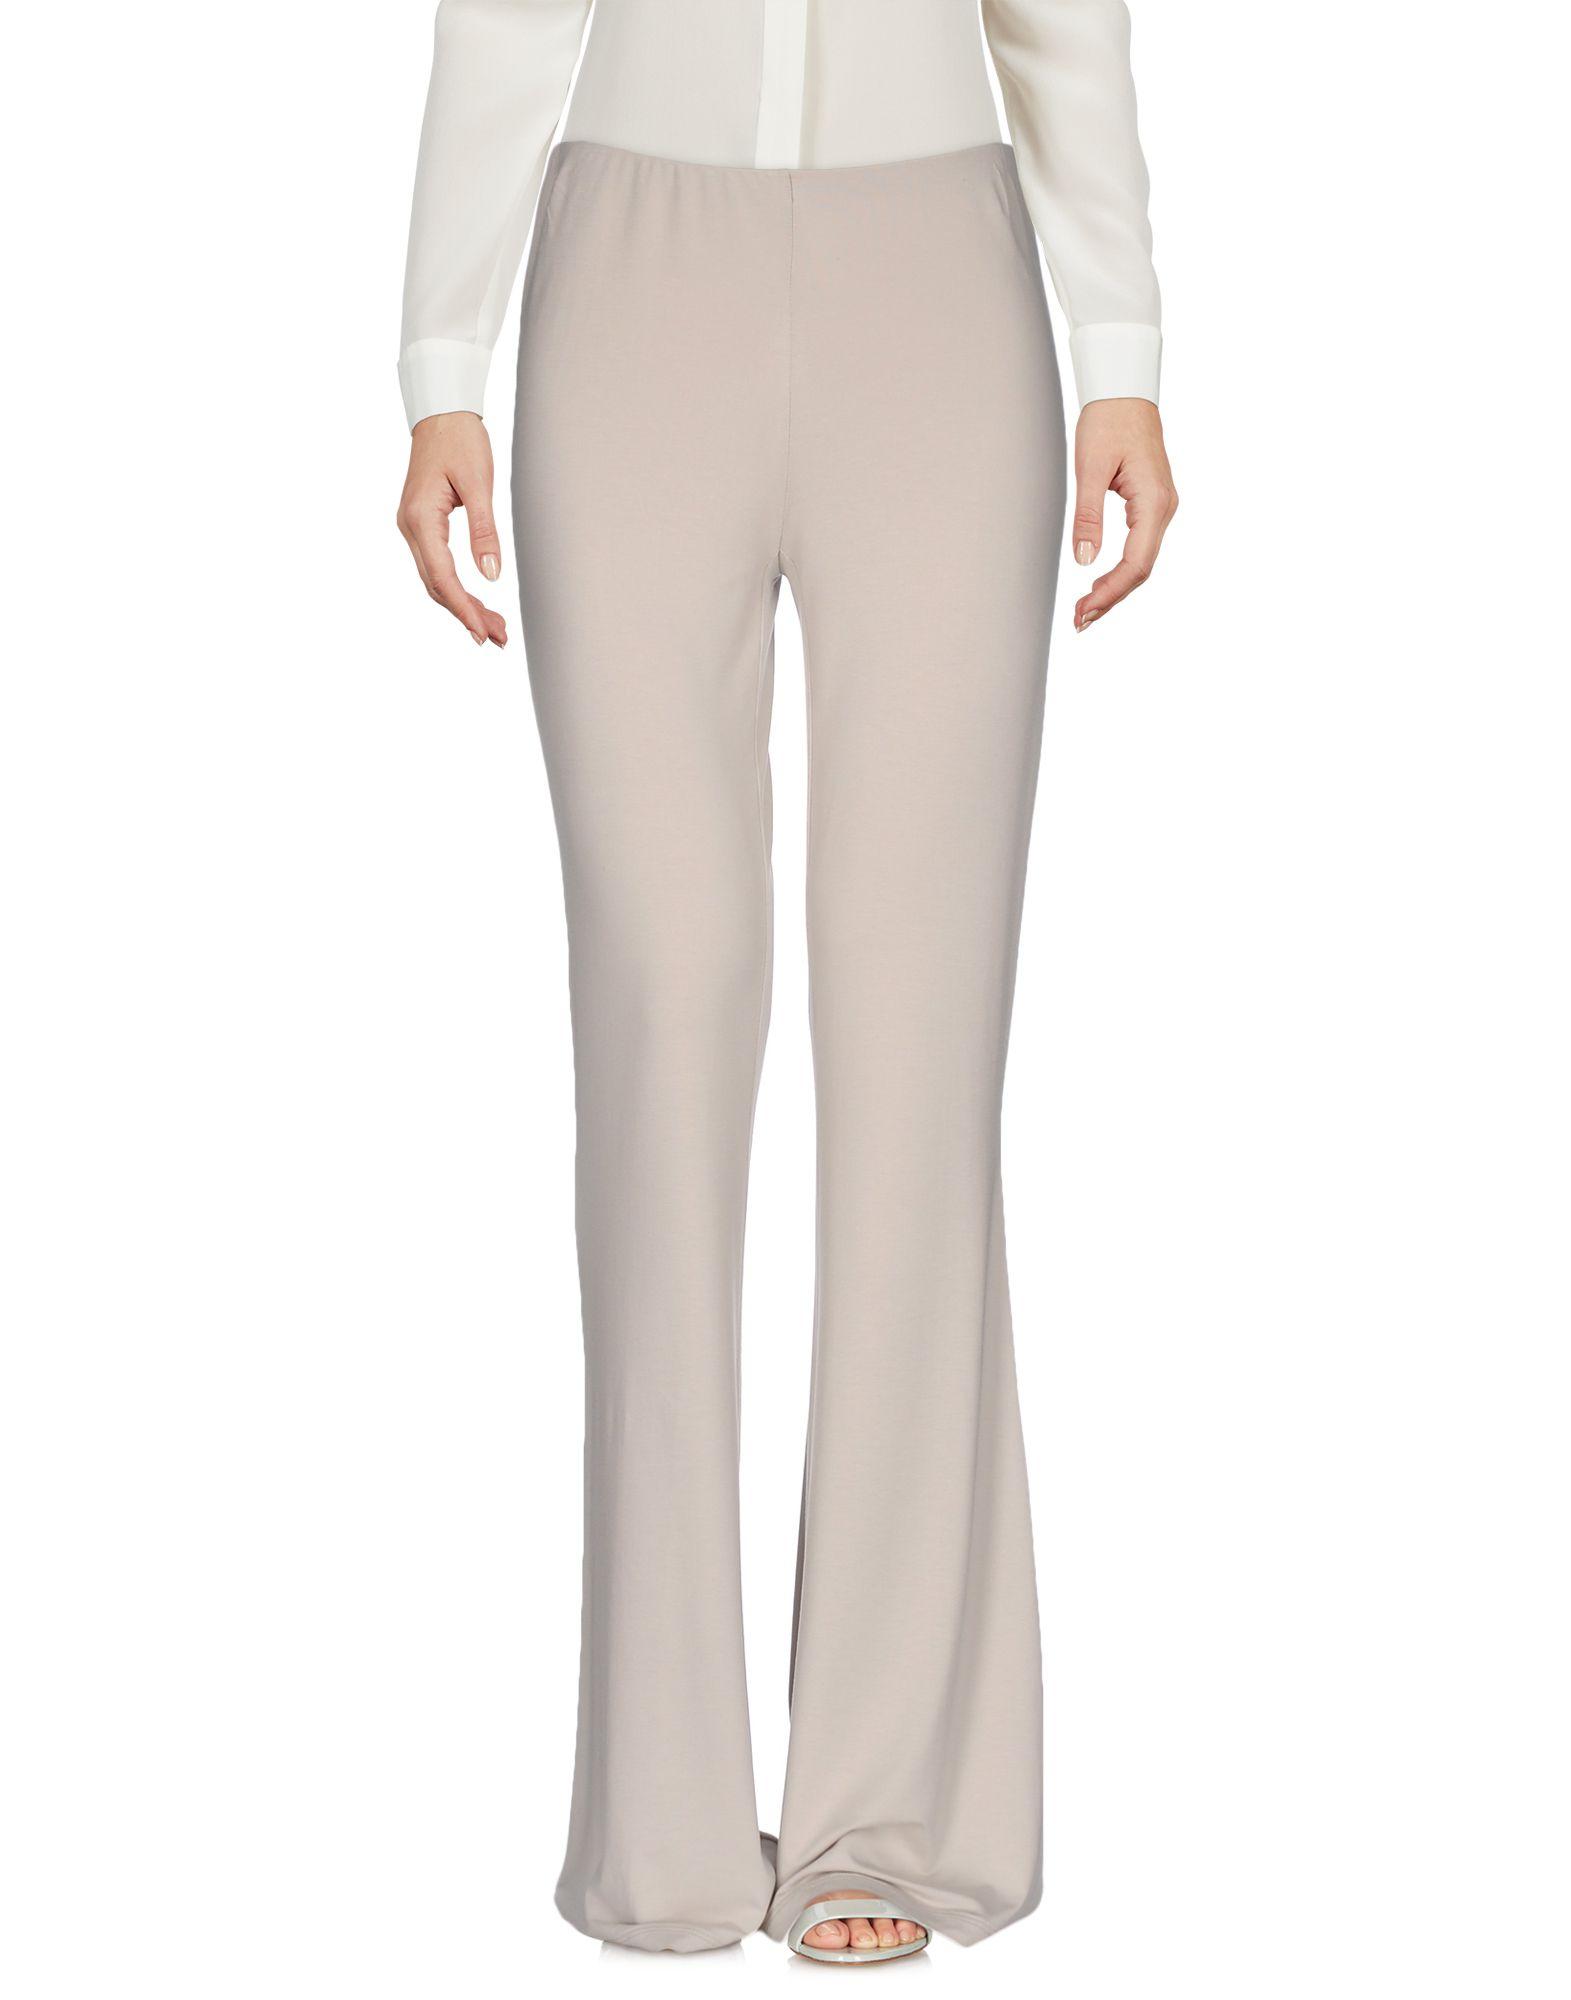 D.EXTERIOR Damen Hose Farbe Grau Größe 3 jetztbilligerkaufen